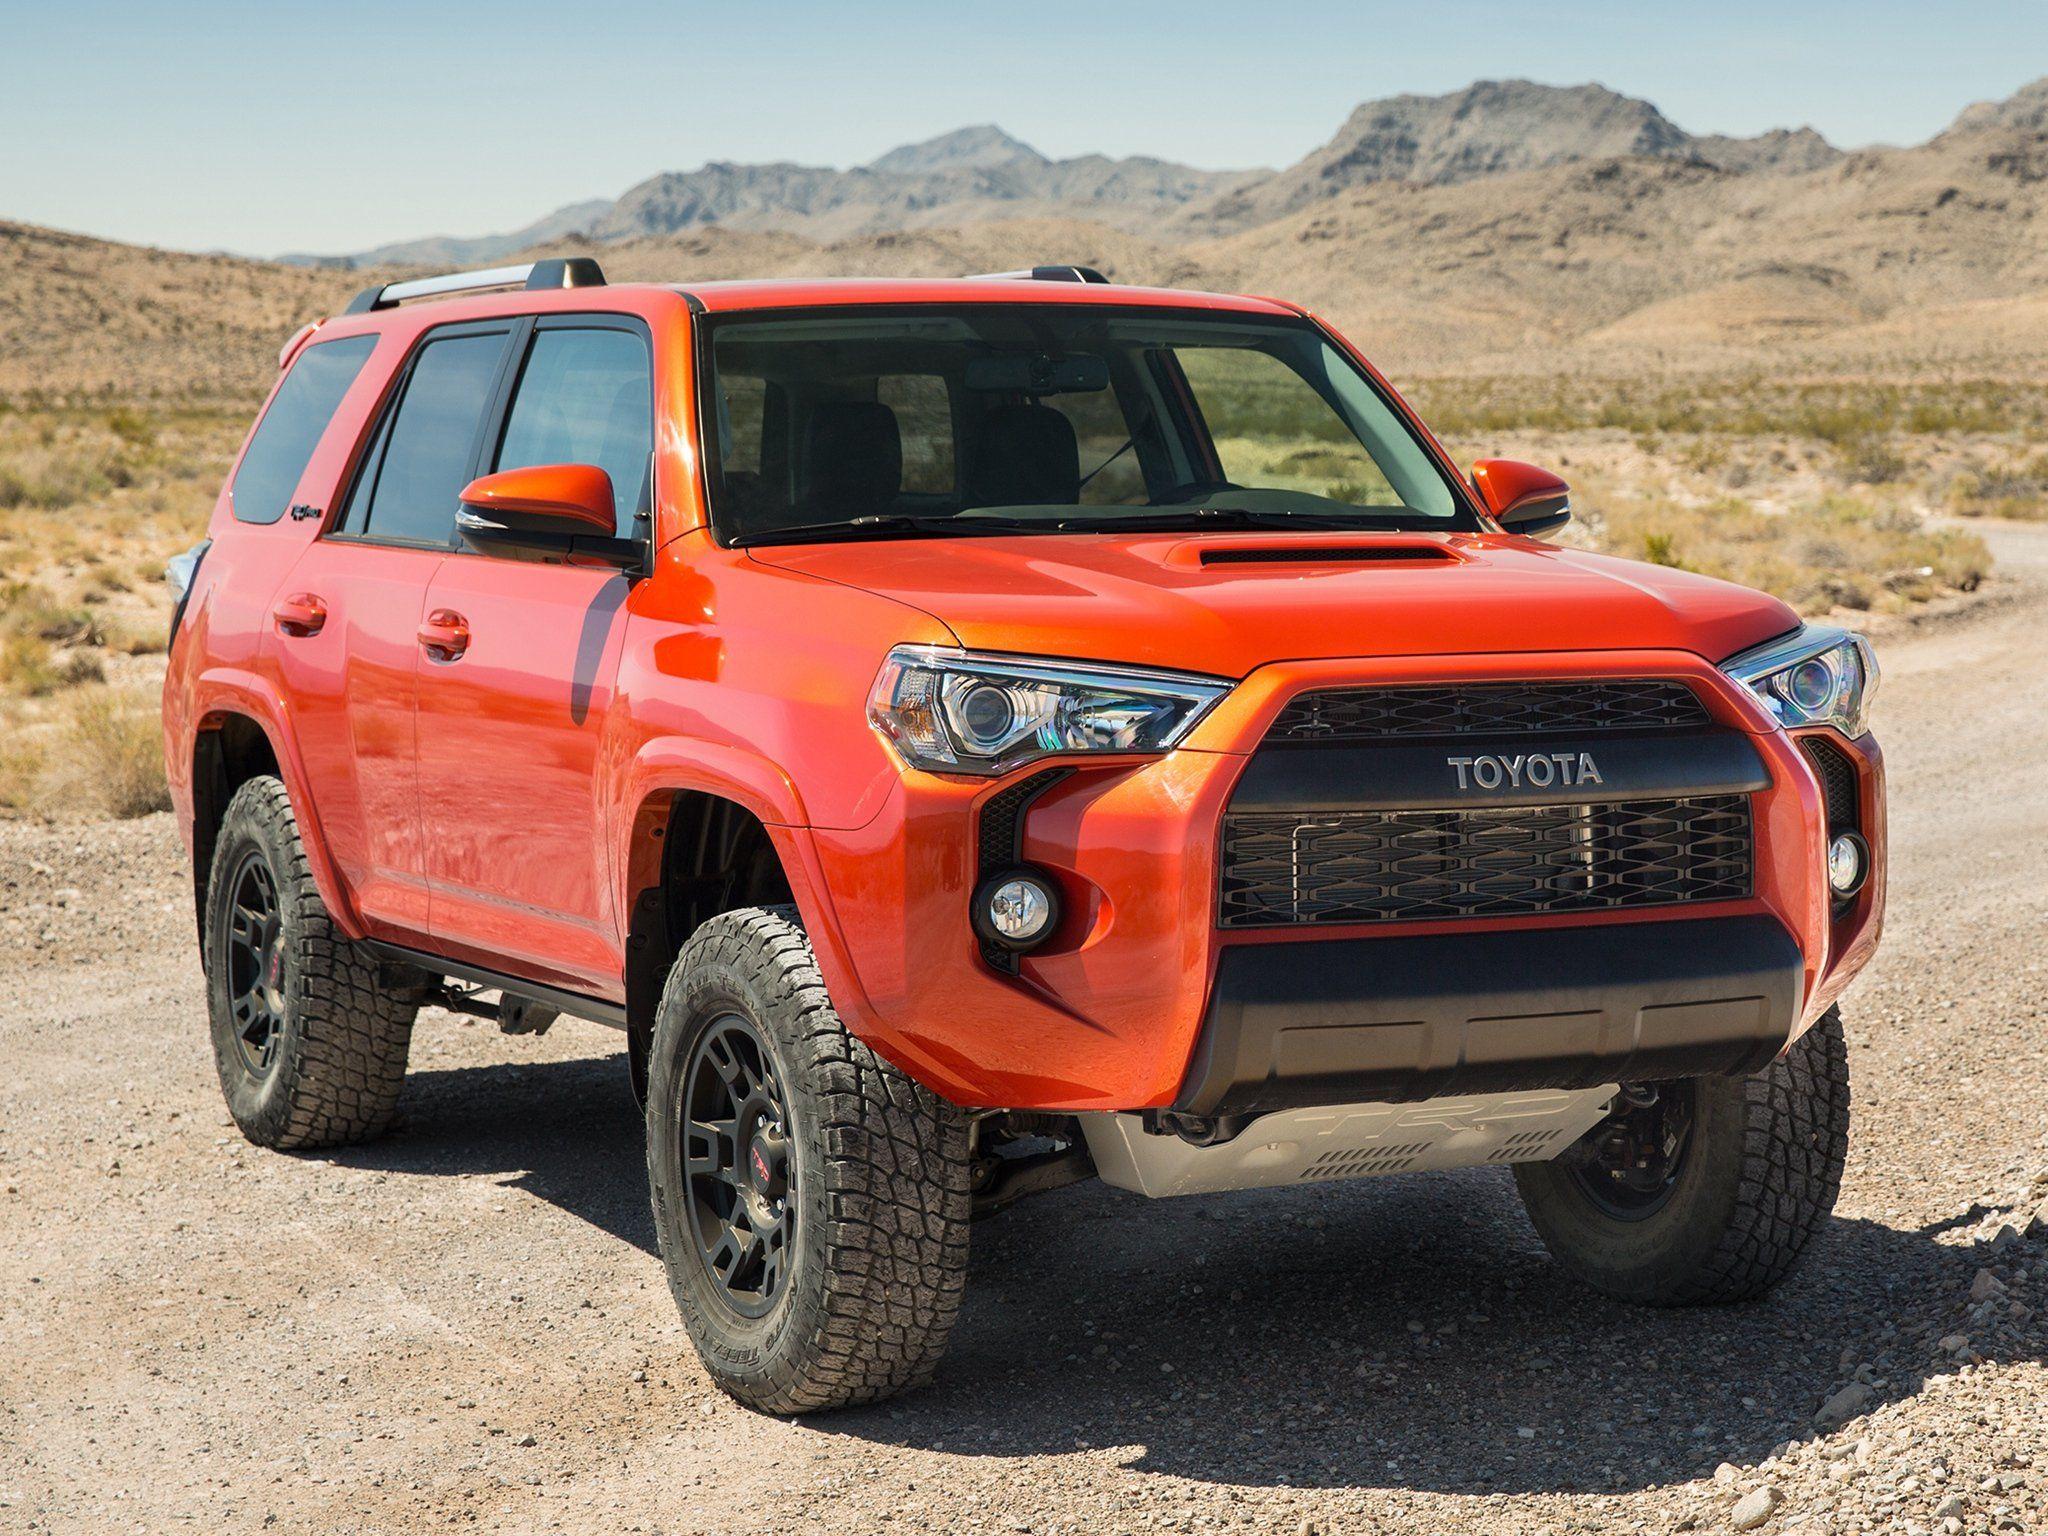 review new agya trd 2018 oli untuk grand avanza 2015 toyota 4runner orange image cars